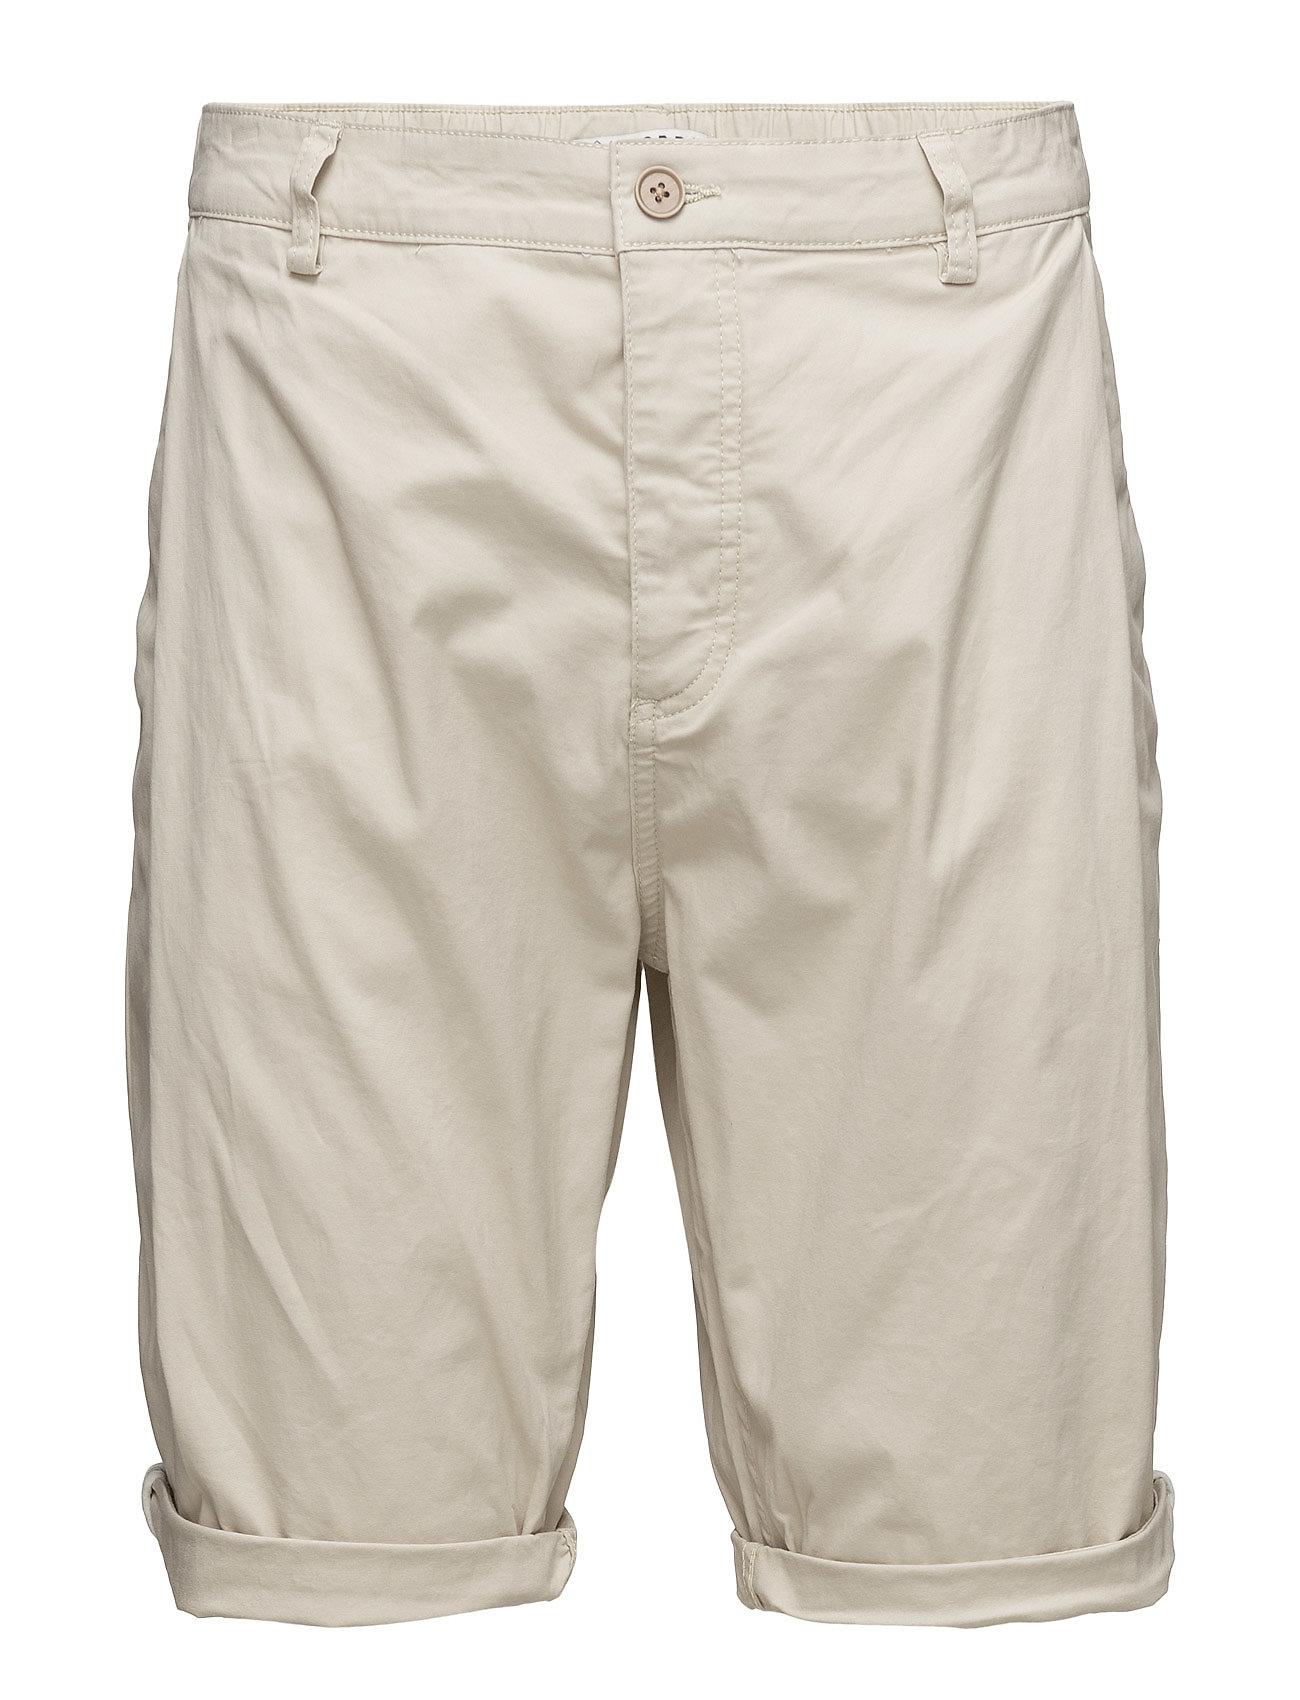 Shorts Woven Esprit Casual Bermuda Shorts